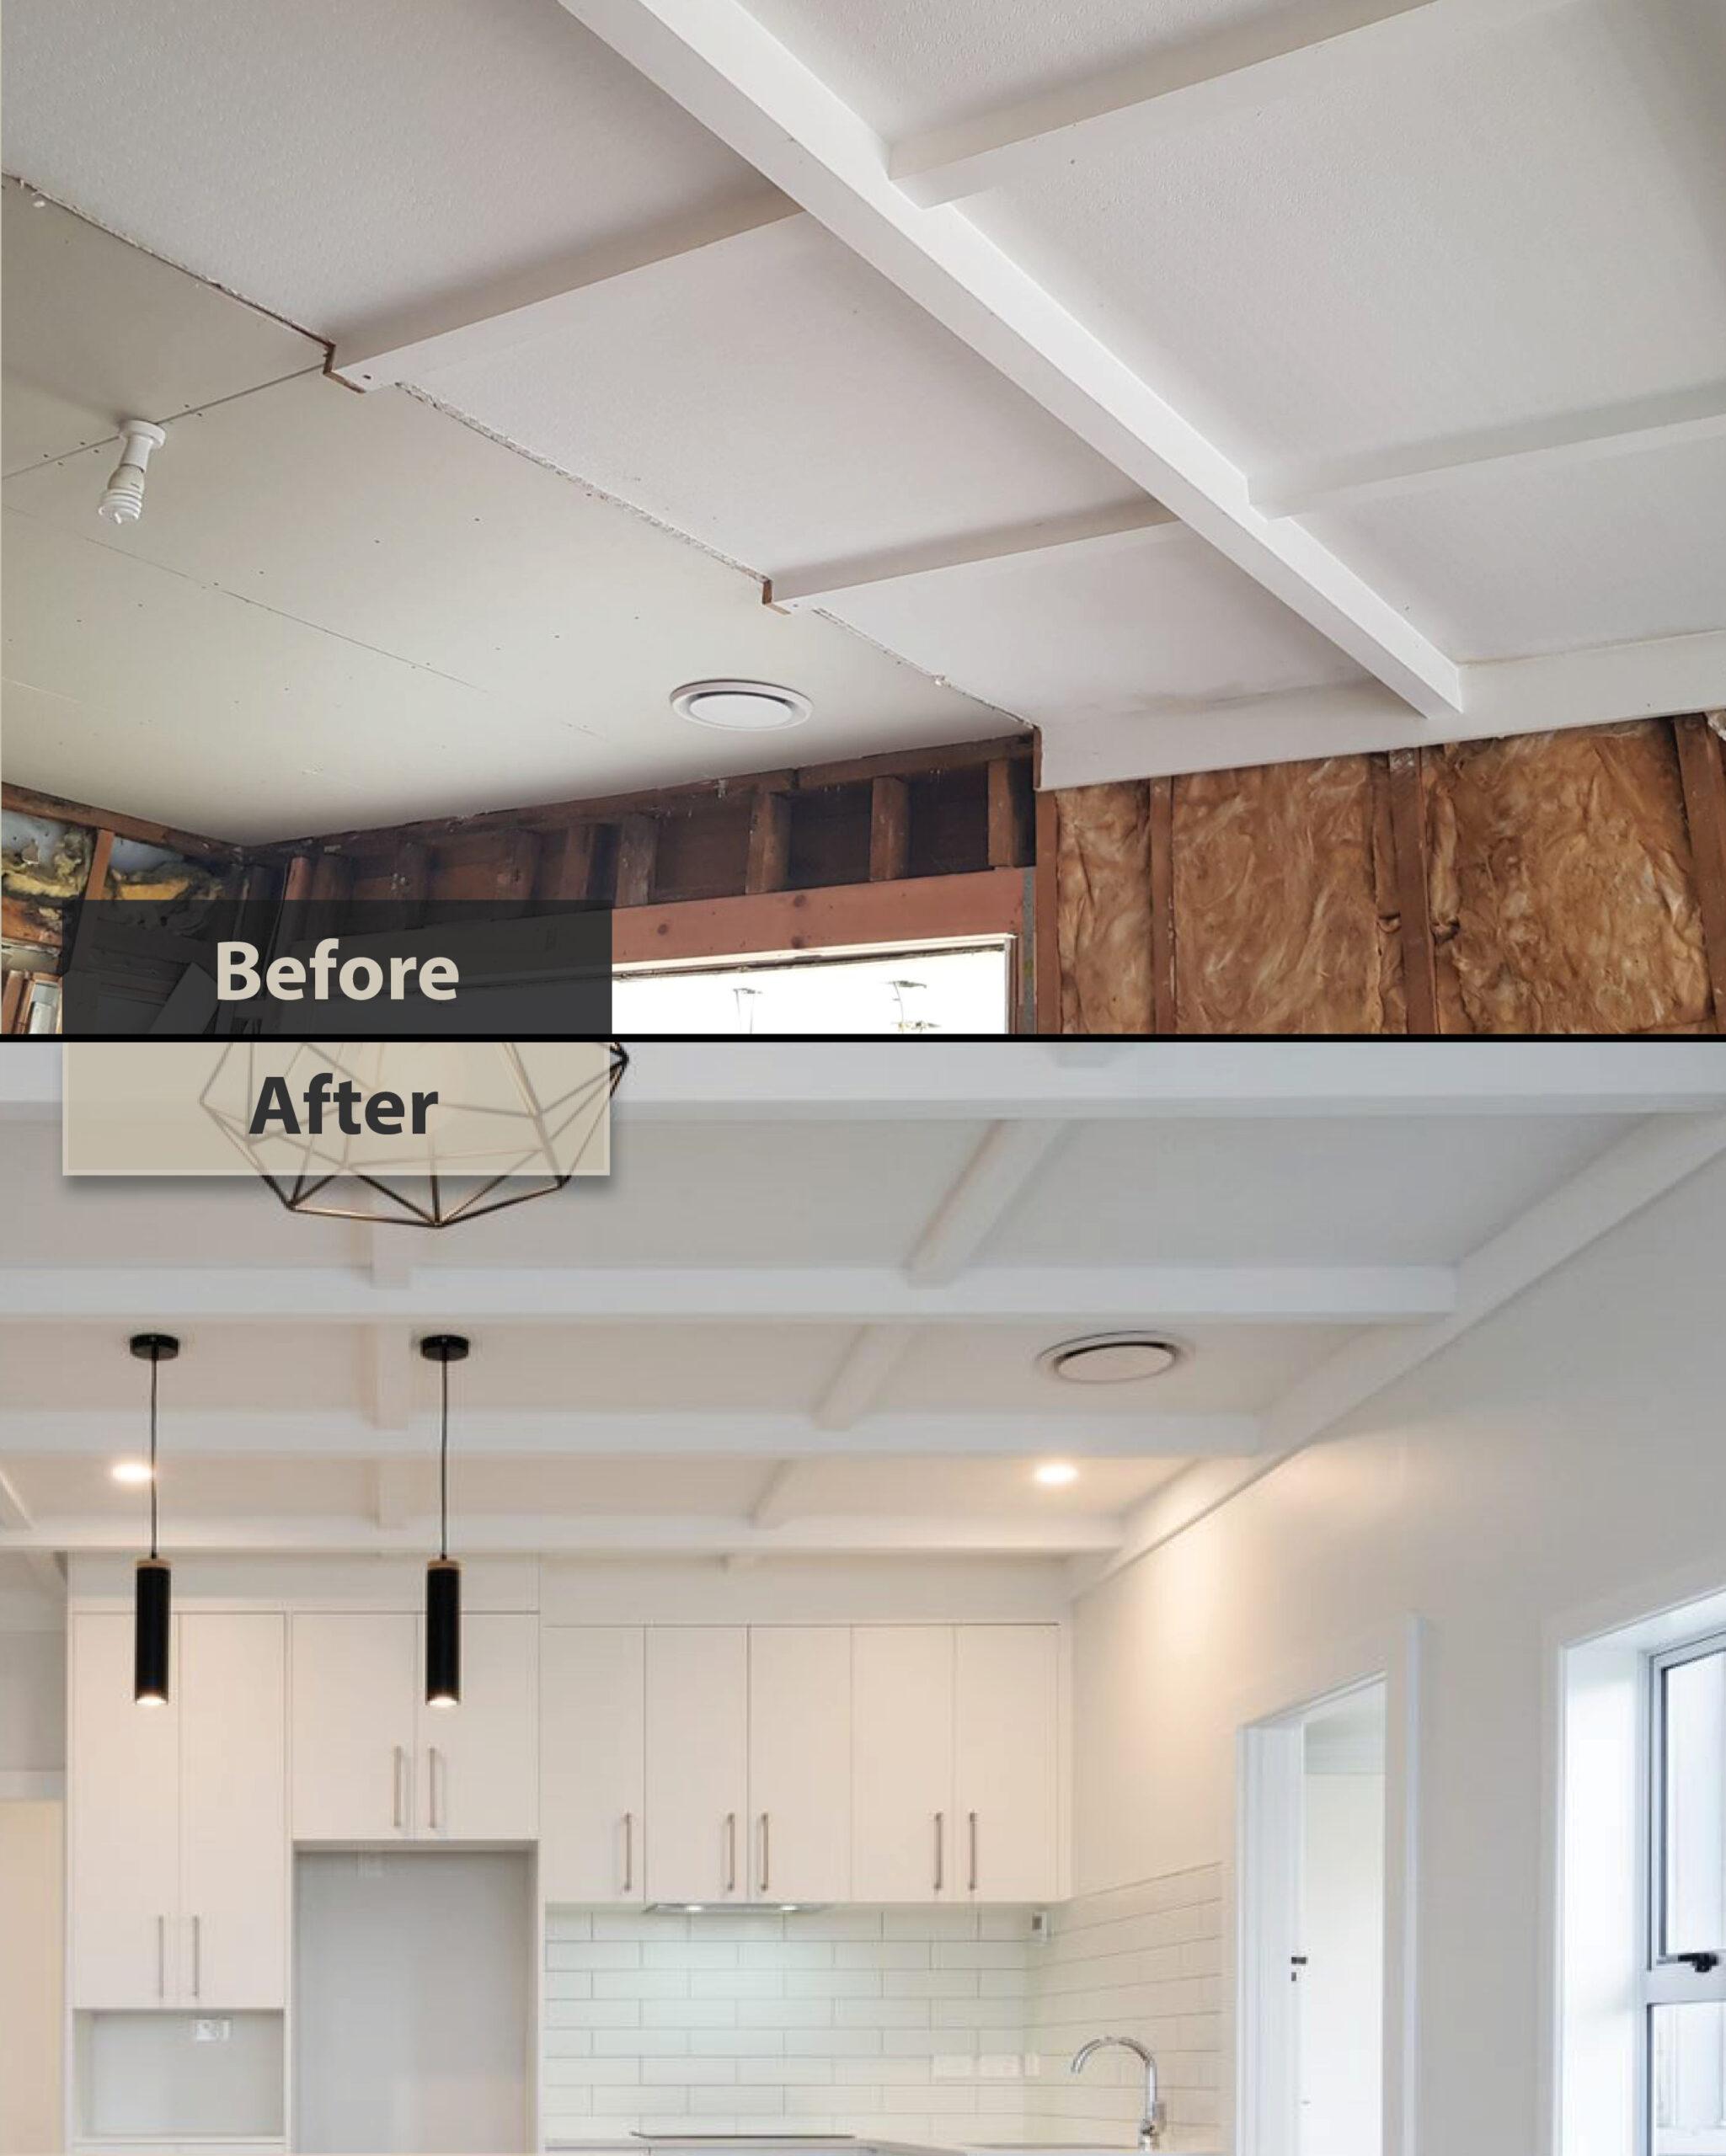 renovating ceiling - papatoetoe house renovation